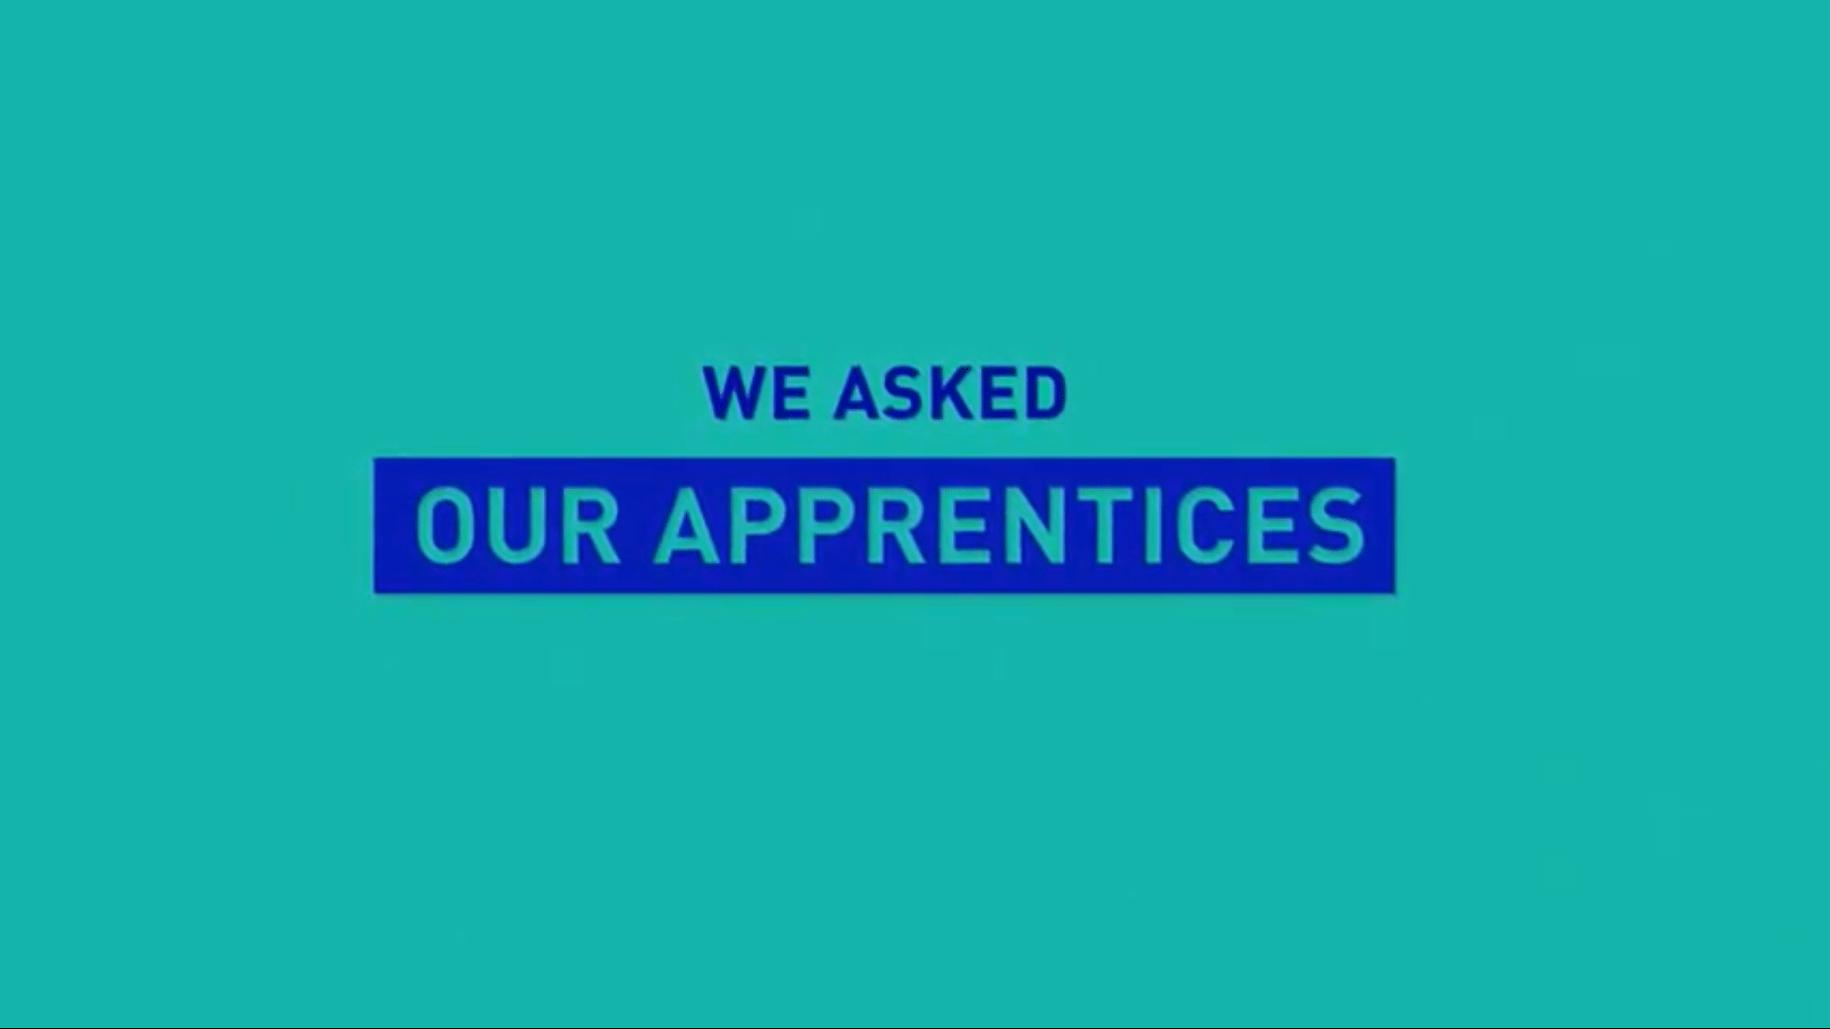 Apprentices video screenshot2